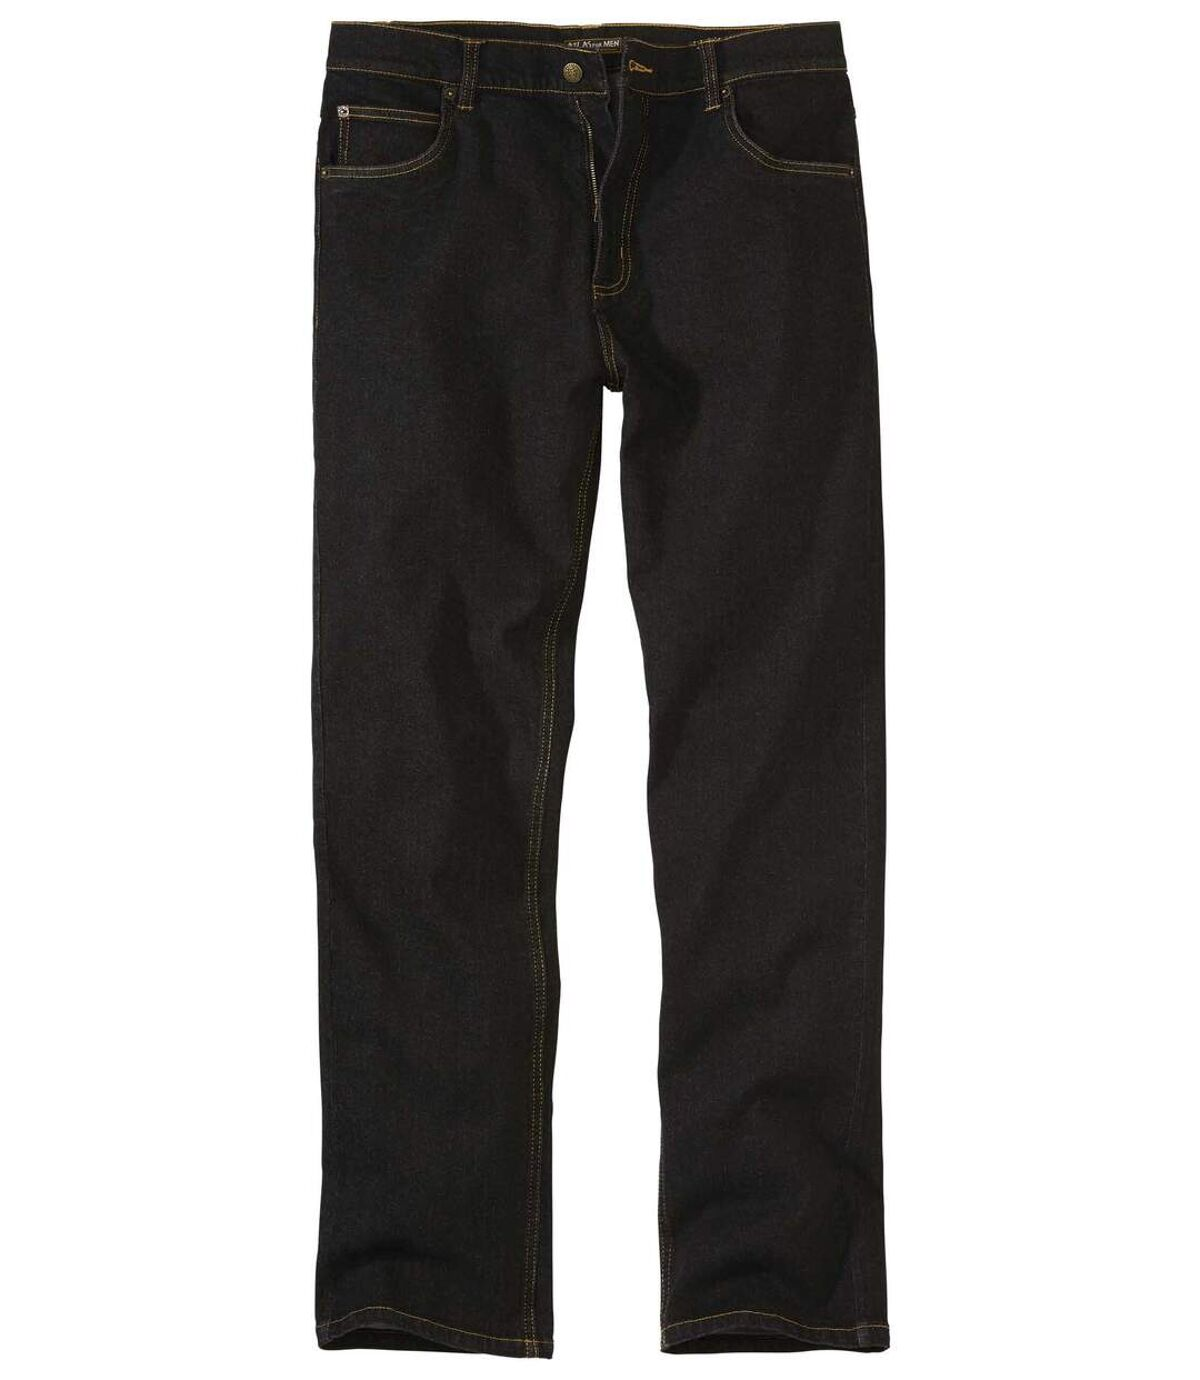 Wygodne czarne jeansy Regular ze stretchem Atlas For Men